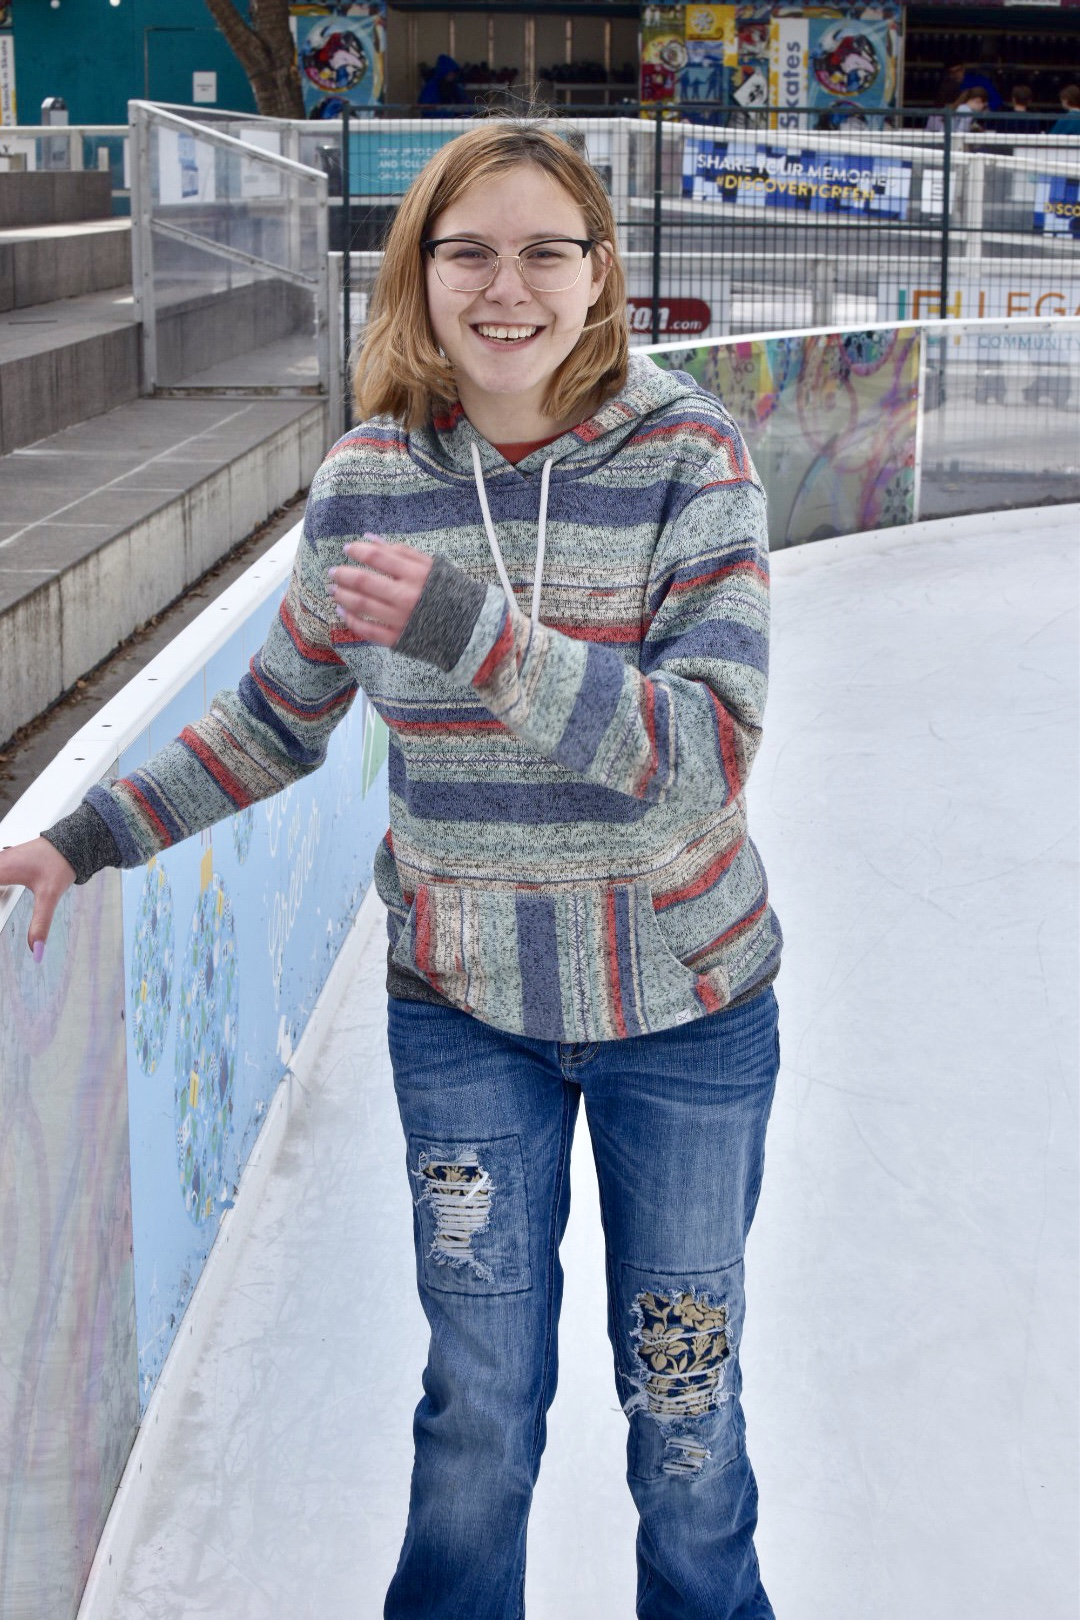 2020 Ice Skating Event